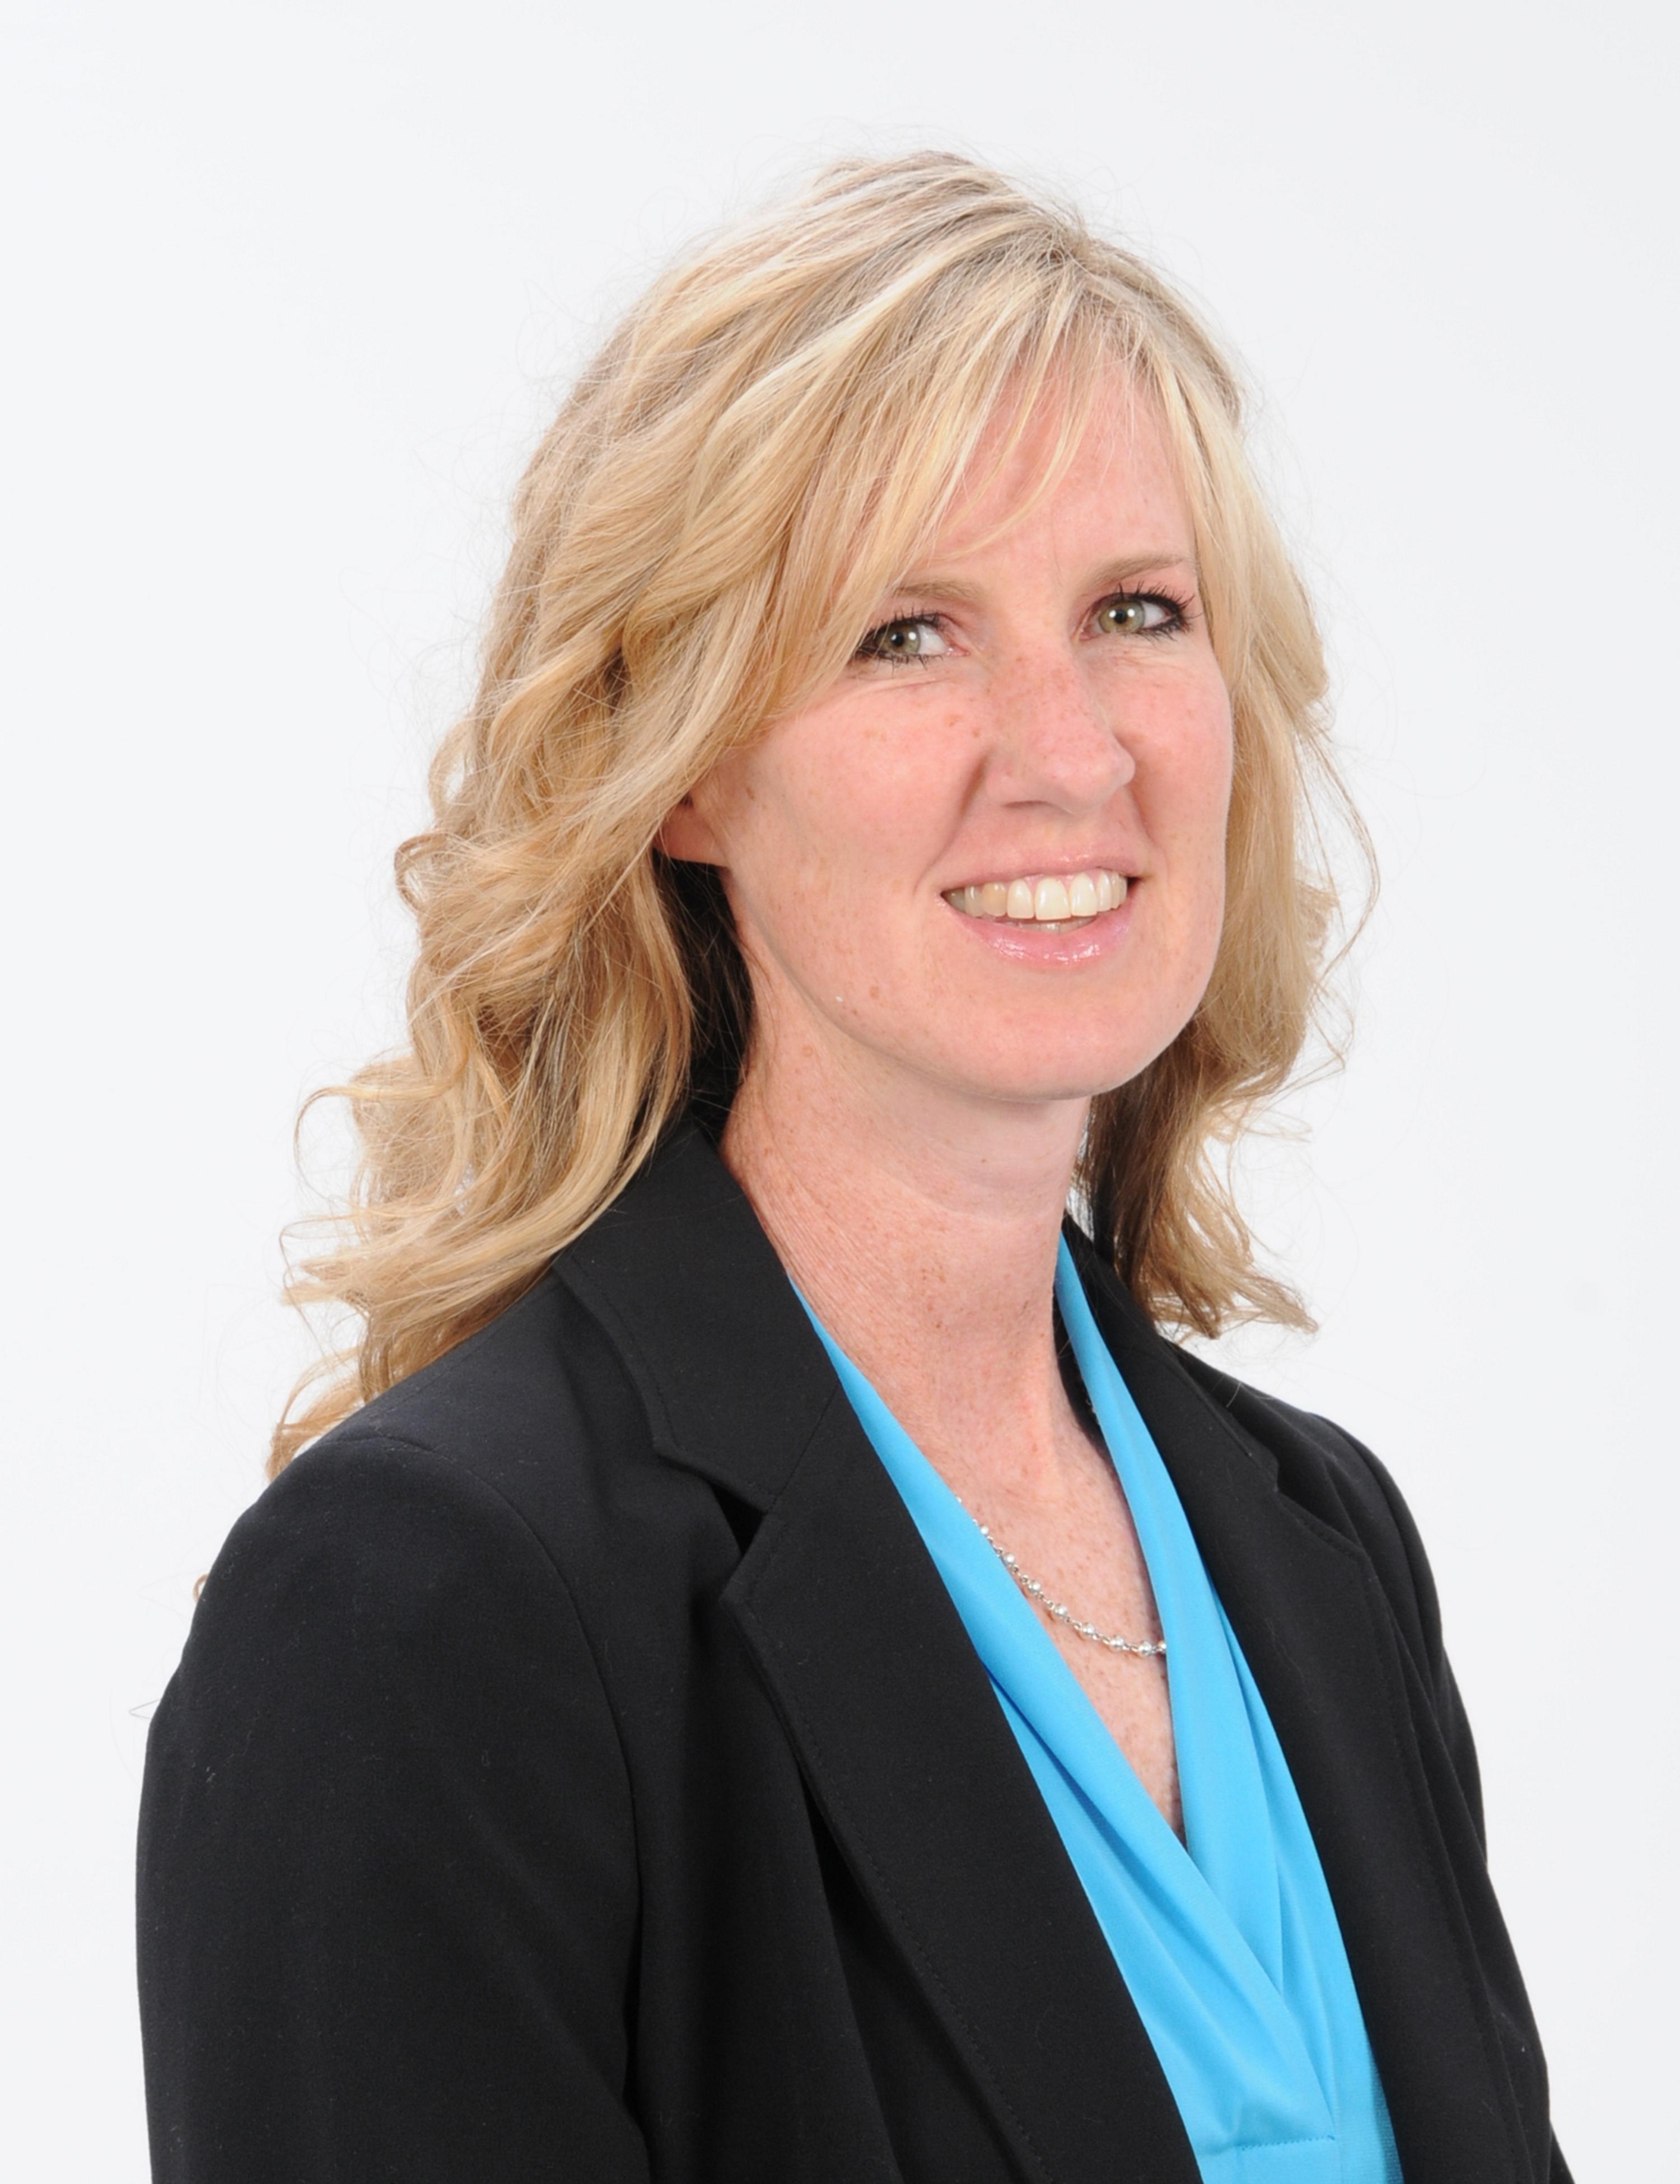 Lori Vowels | Senior Accountant